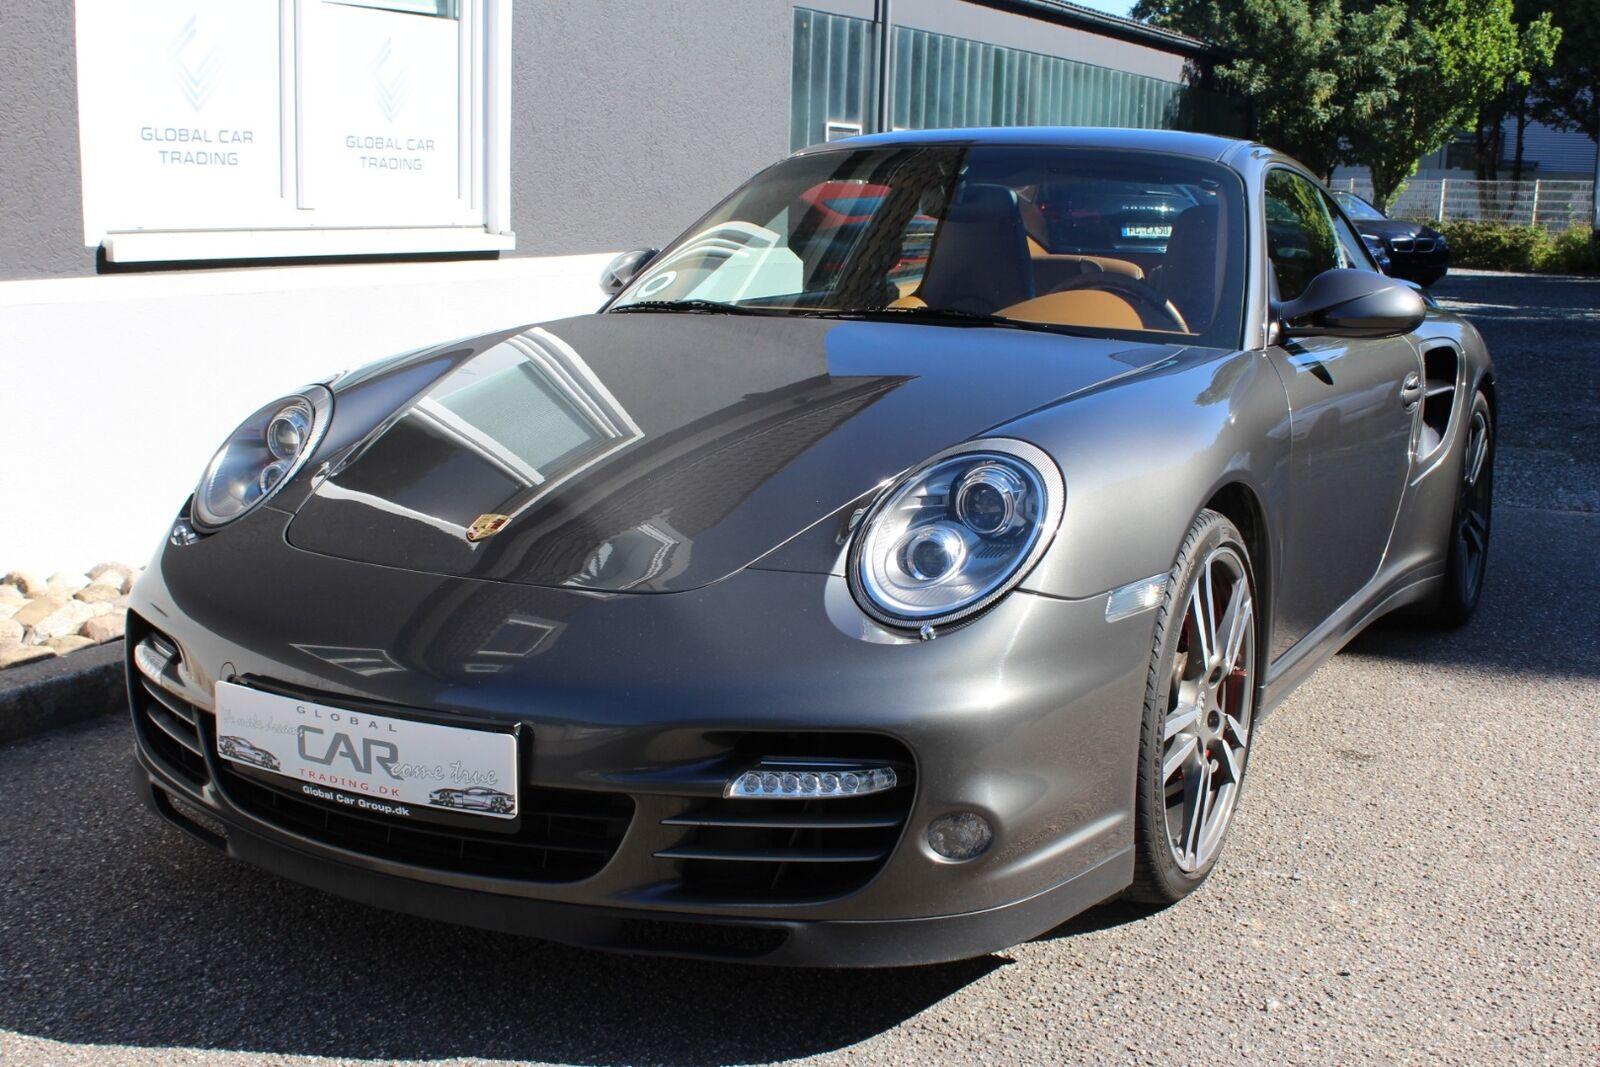 Porsche 911 Turbo 3,8 Coupé PDK 2d - 7.940 kr.